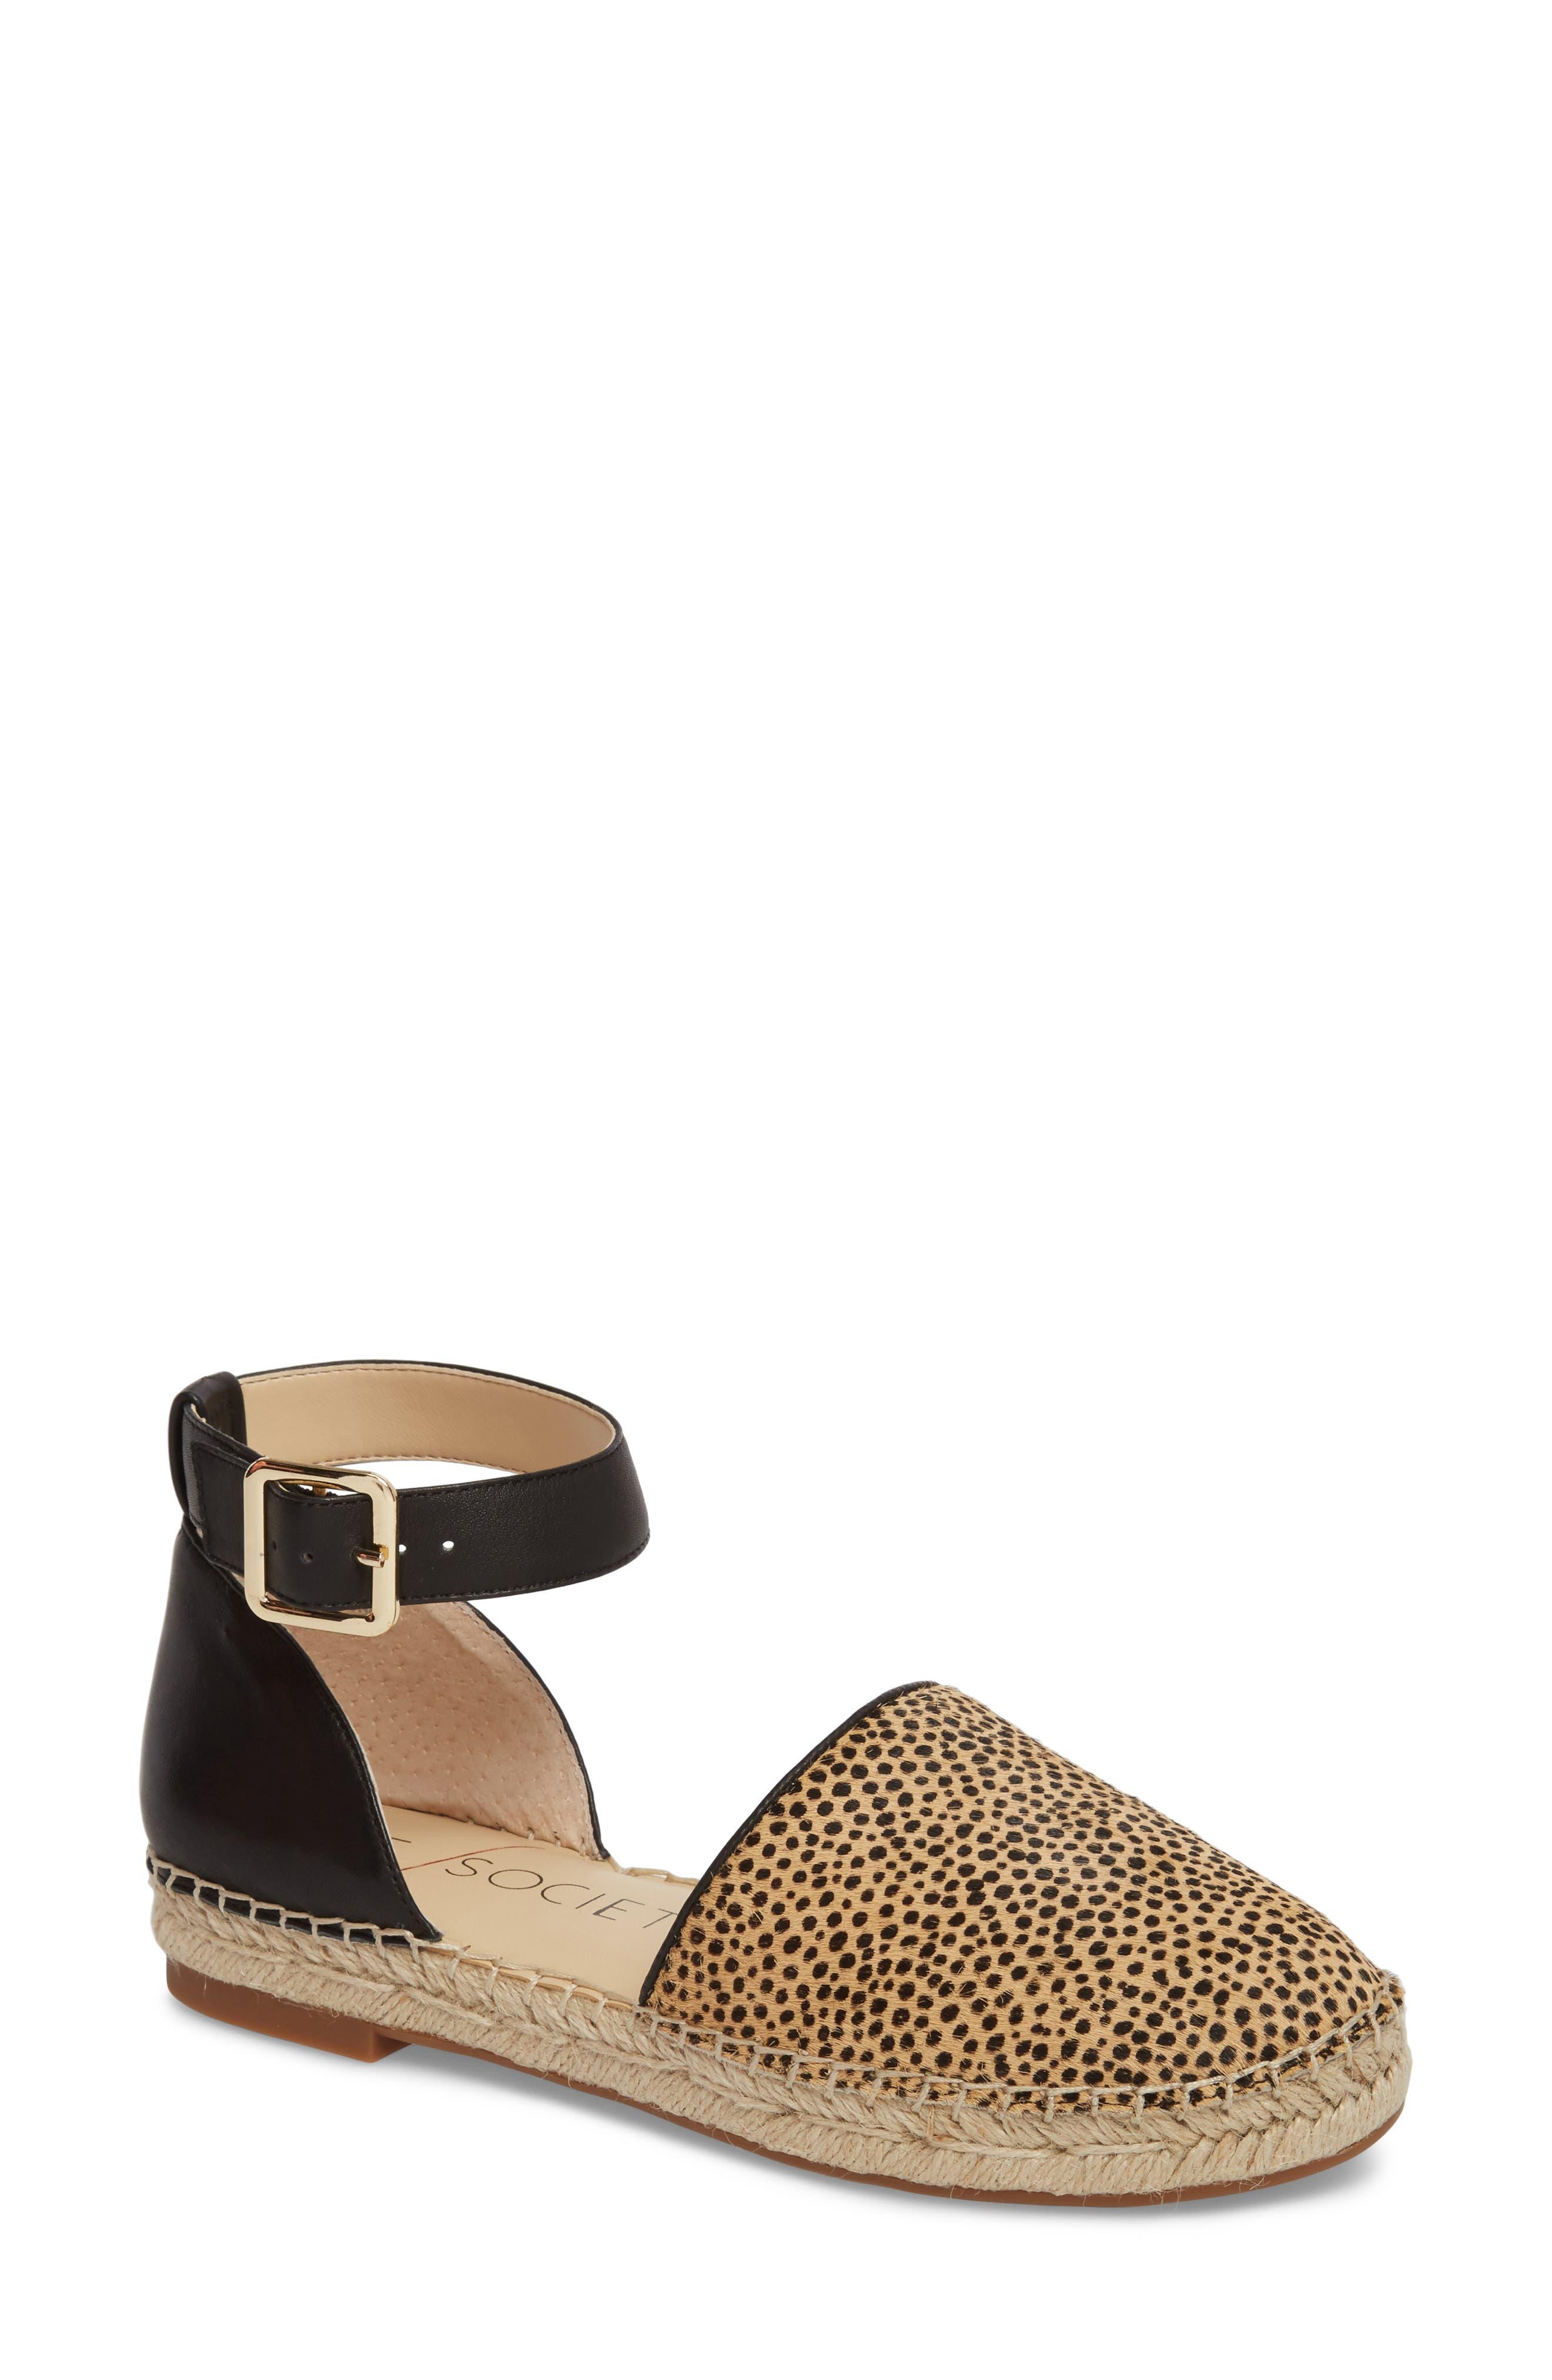 Main Image - Sole Society Stacie Genuine Calf Hair Espadrille Sandal (Women)